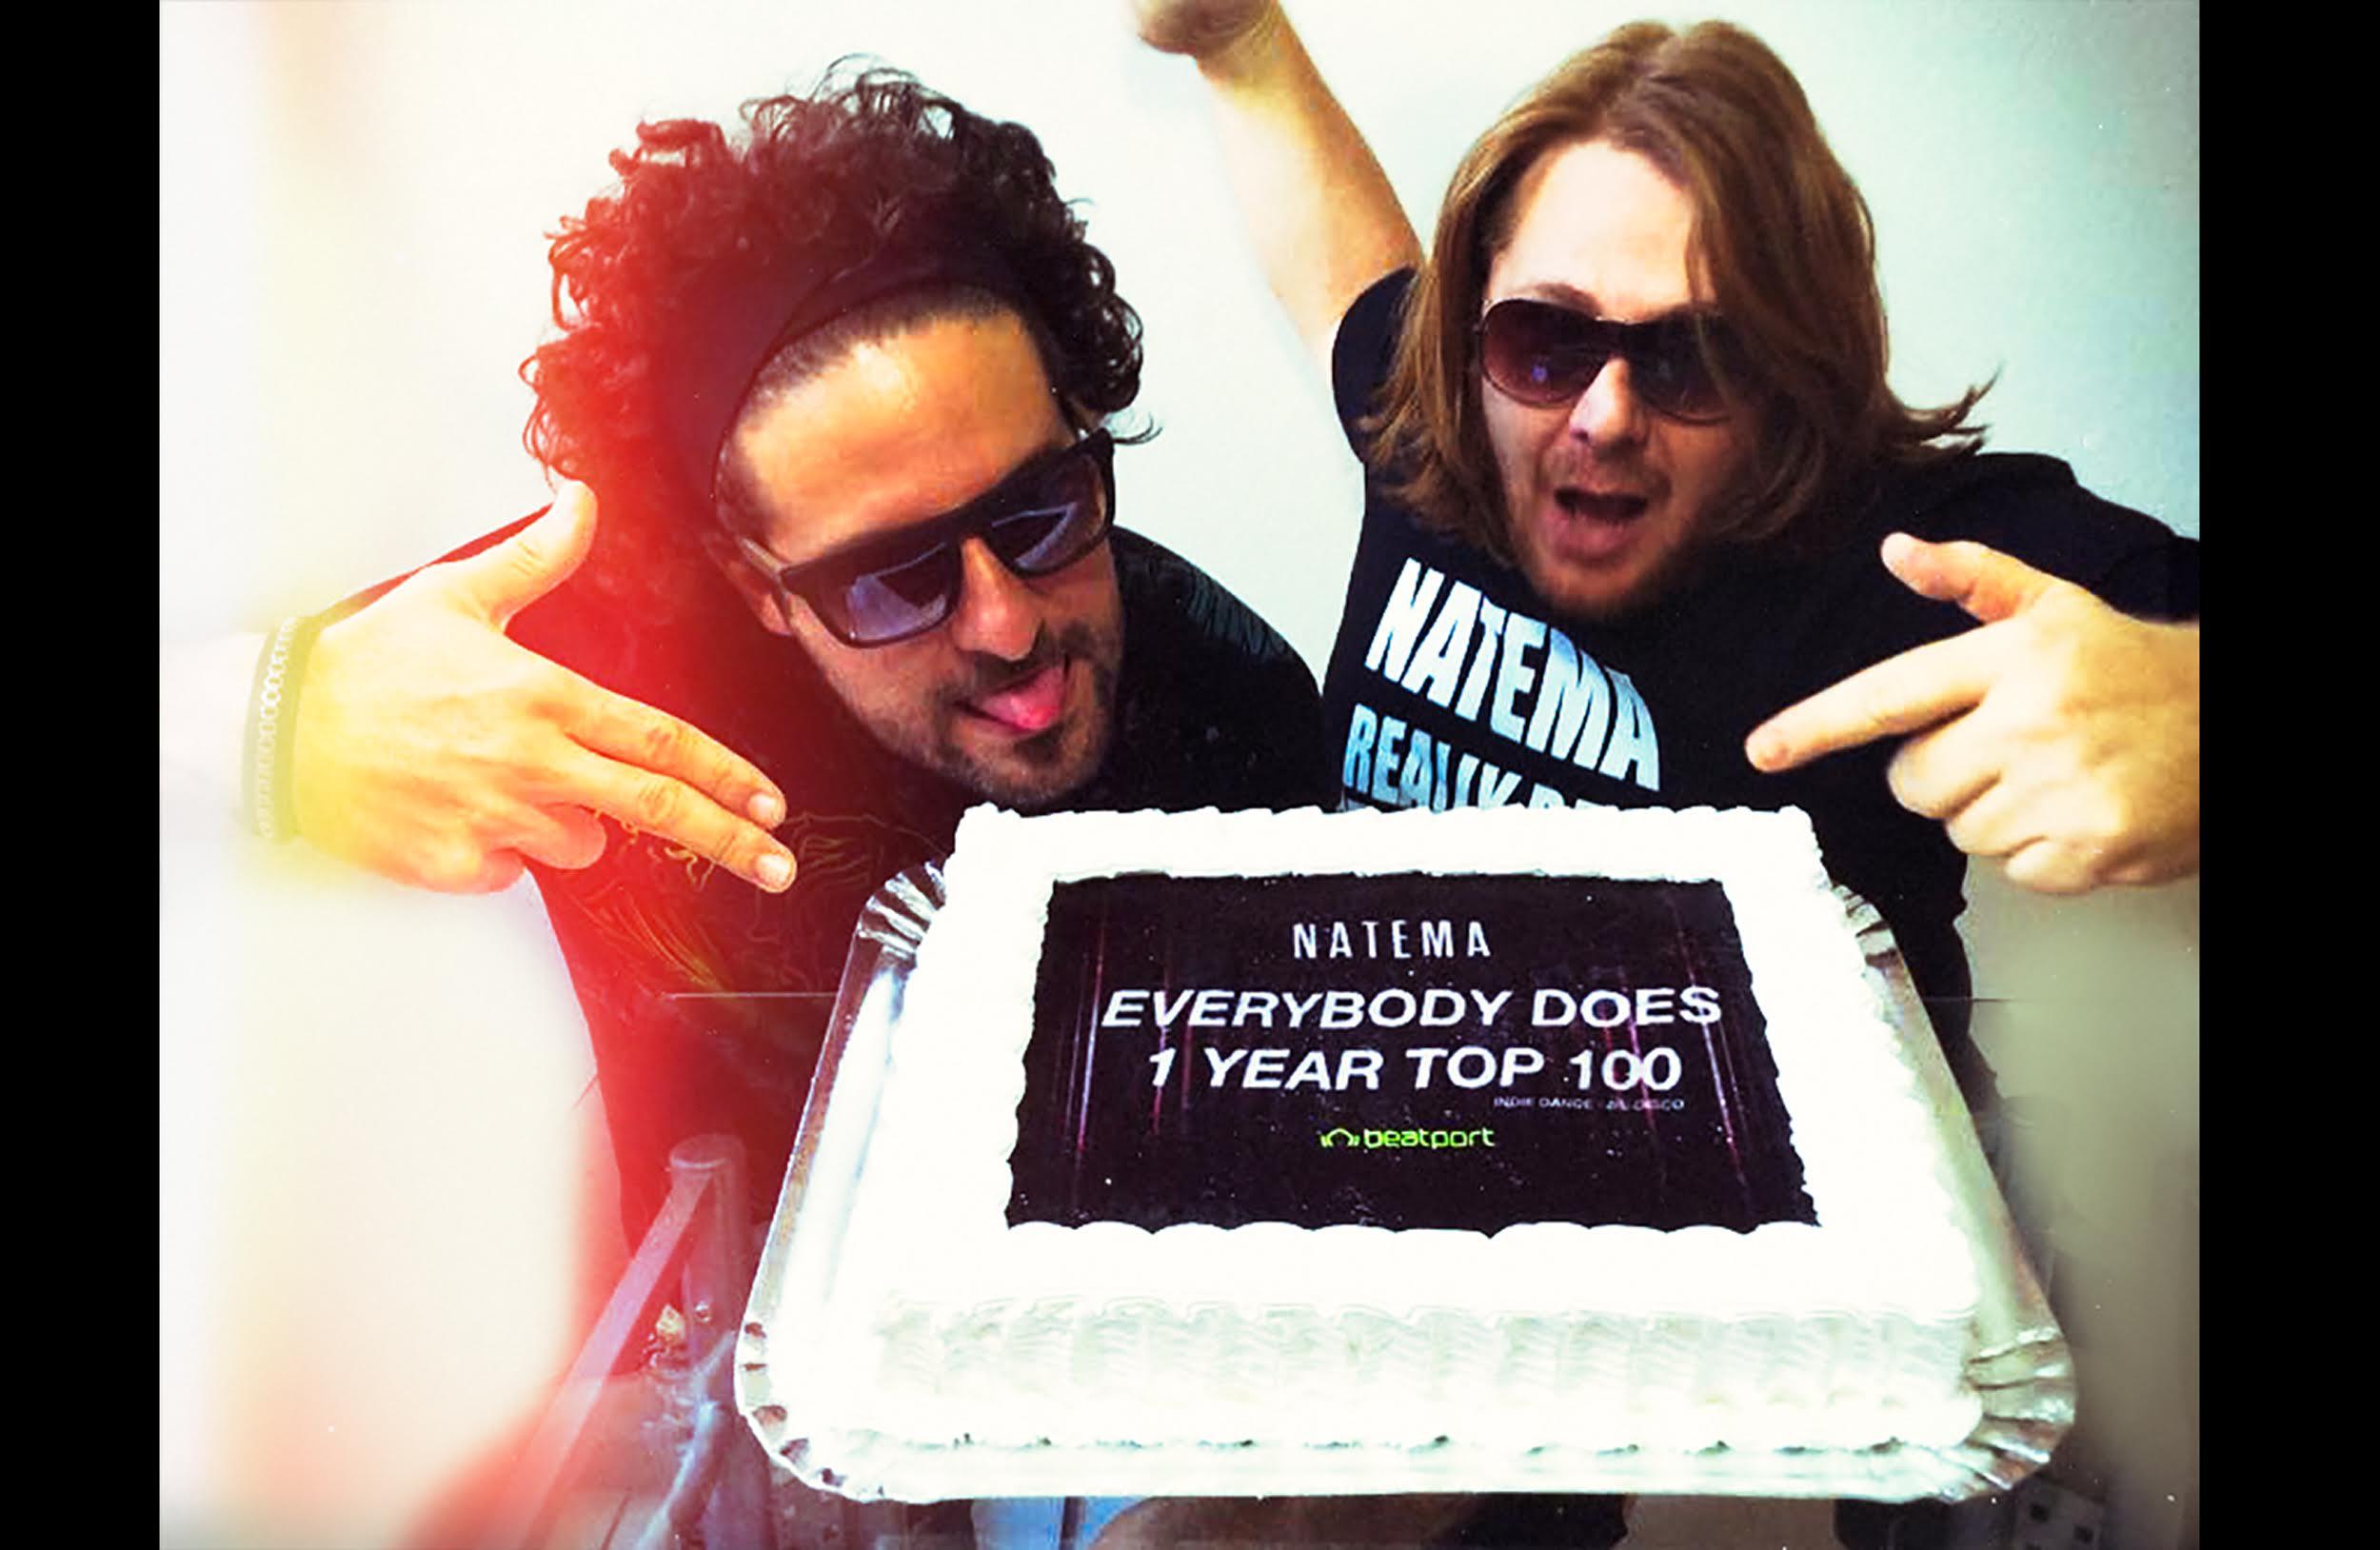 "Natema - Everybody Does: 1 ano no Top100 do Beatport ""Everybody Does"", beatport, natema, Top100"